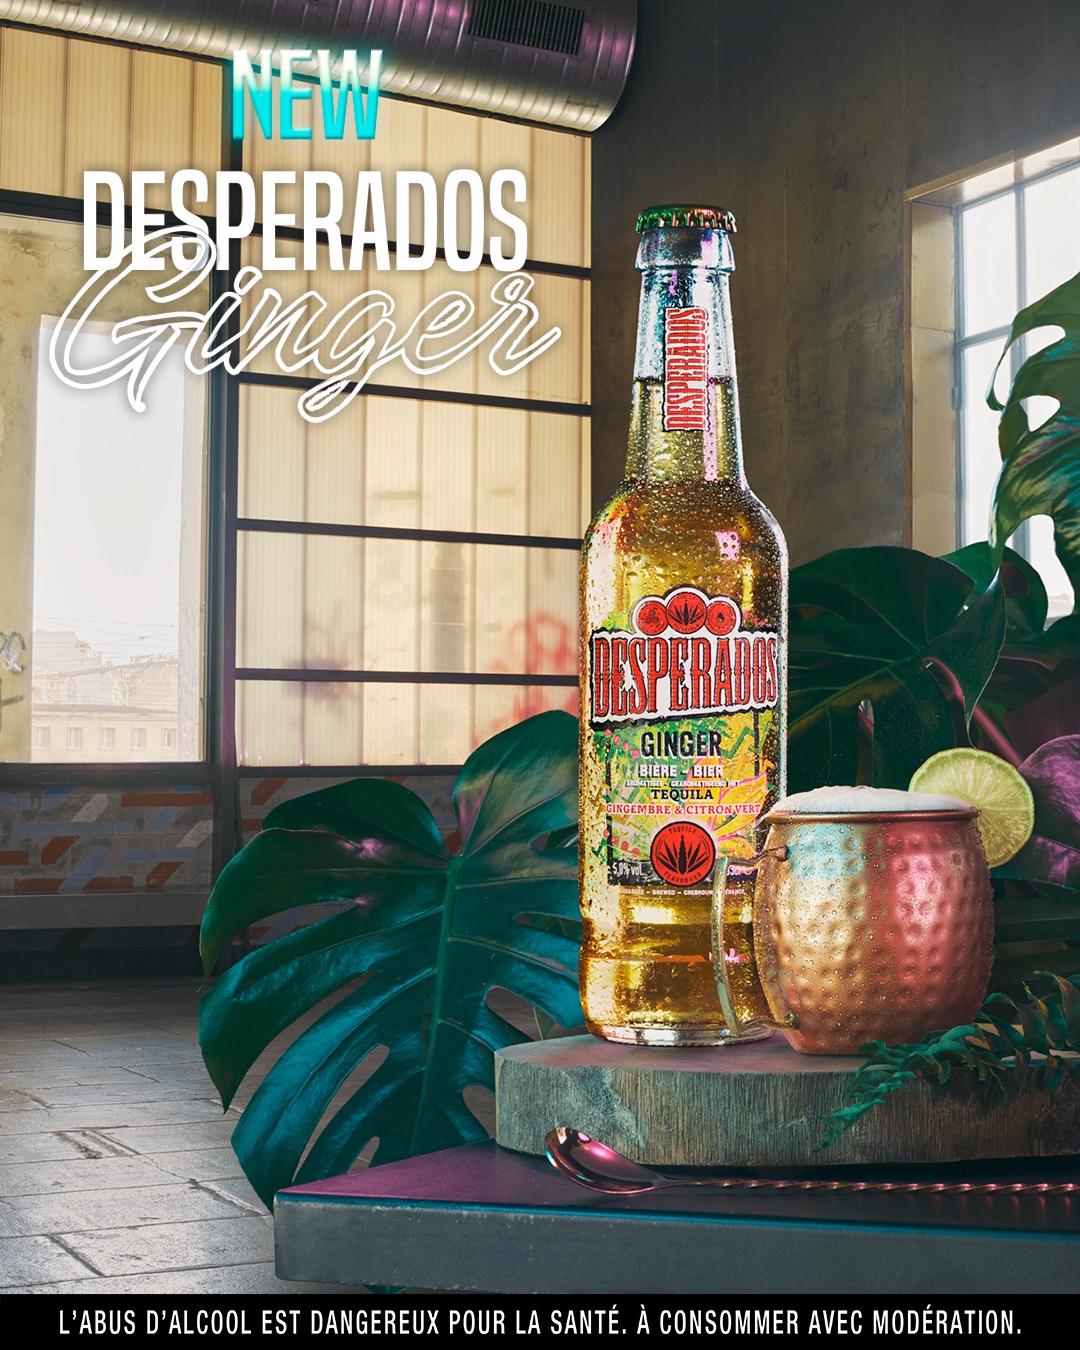 New Desperados Ginger Gingembre Citron Tequila Citron Vert